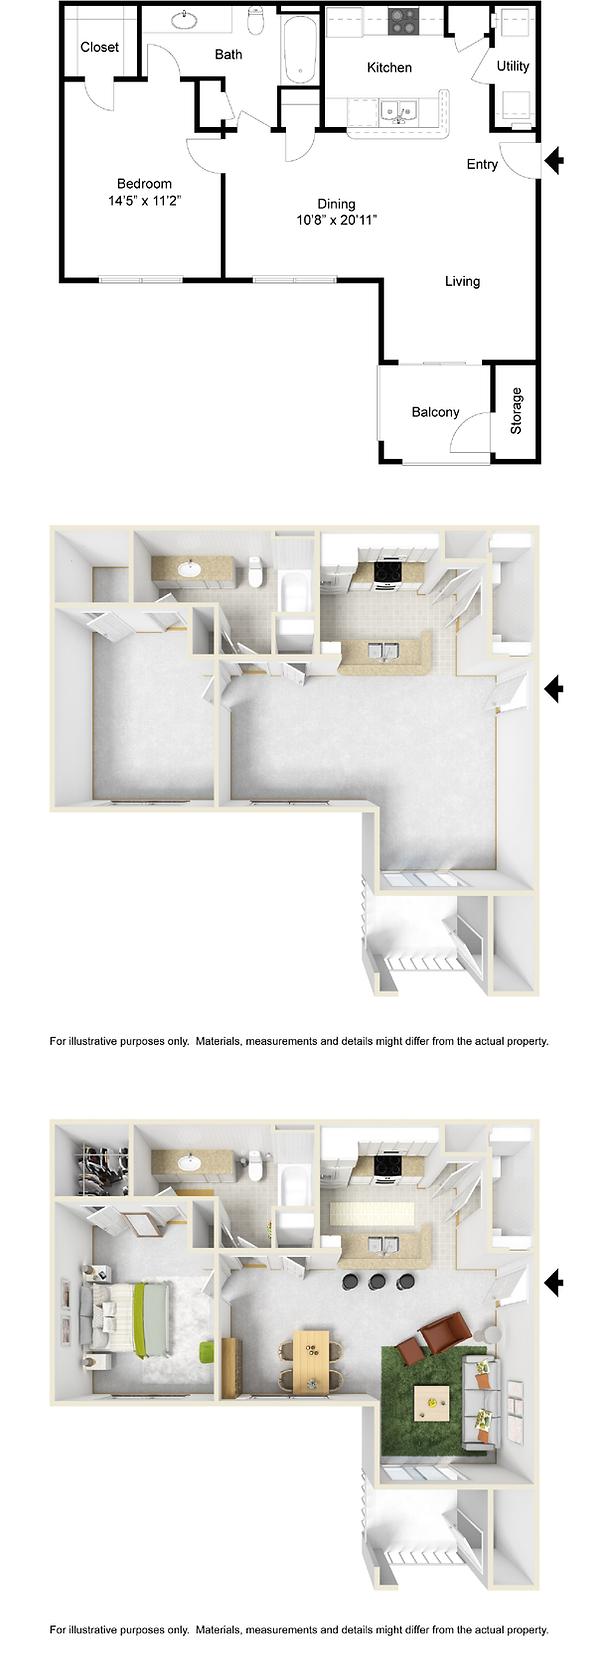 1 bedroom 1 bath apartment for rent in Pella